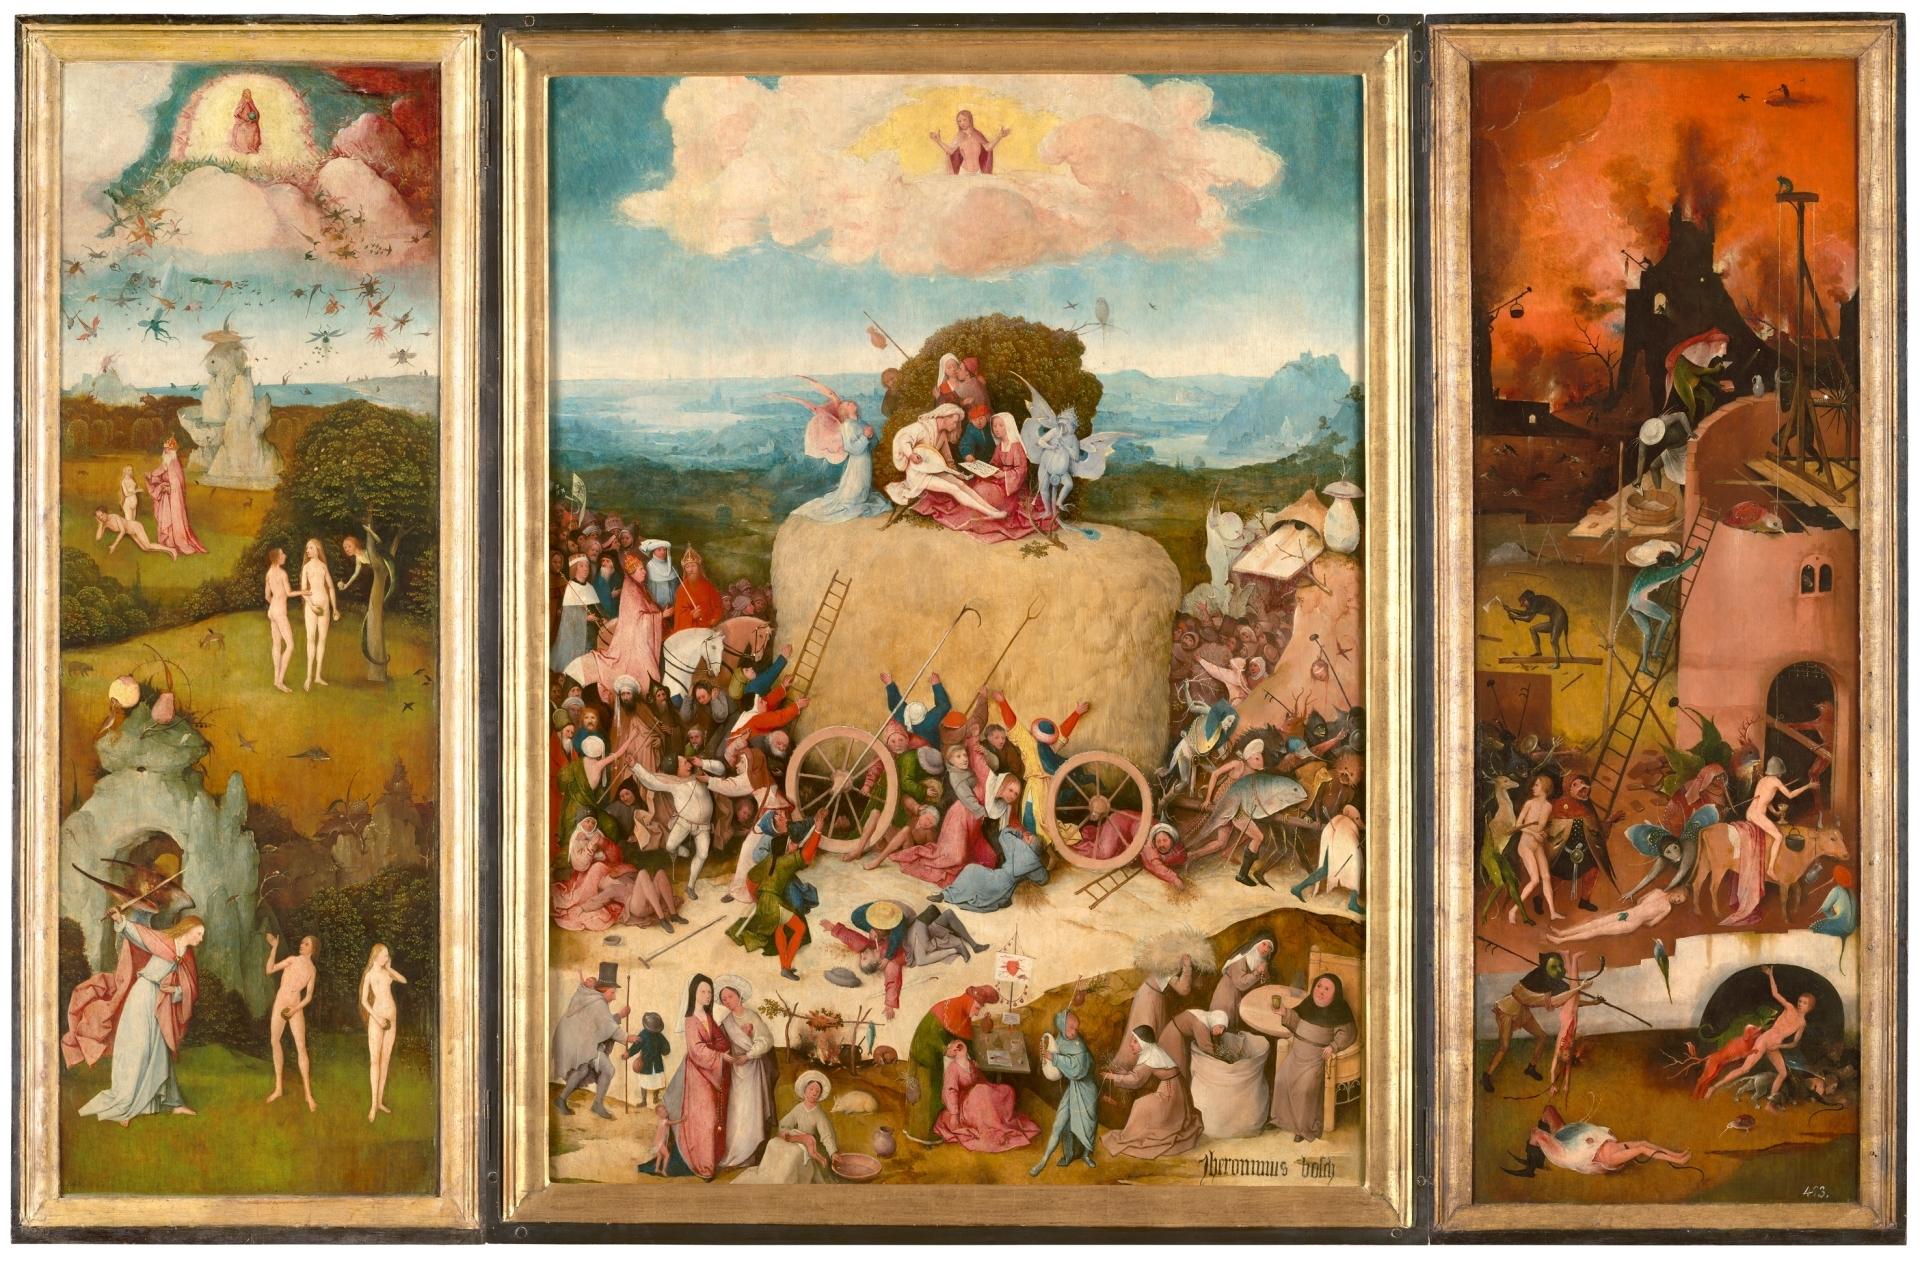 The Haywain Triptych - The Collection - Museo Nacional del Prado